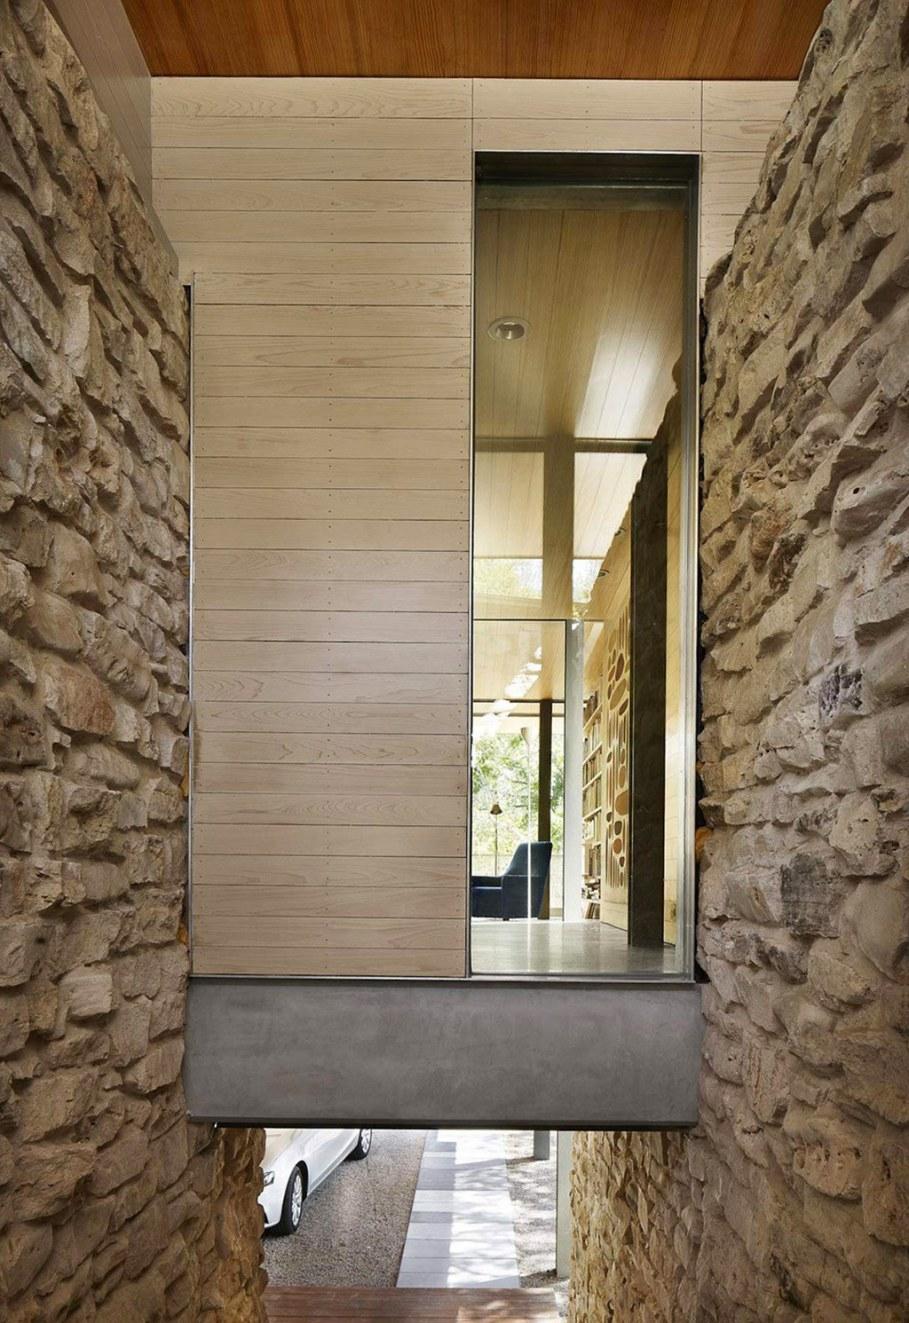 Balcones House From Pollen Architecture & Design Studio 3